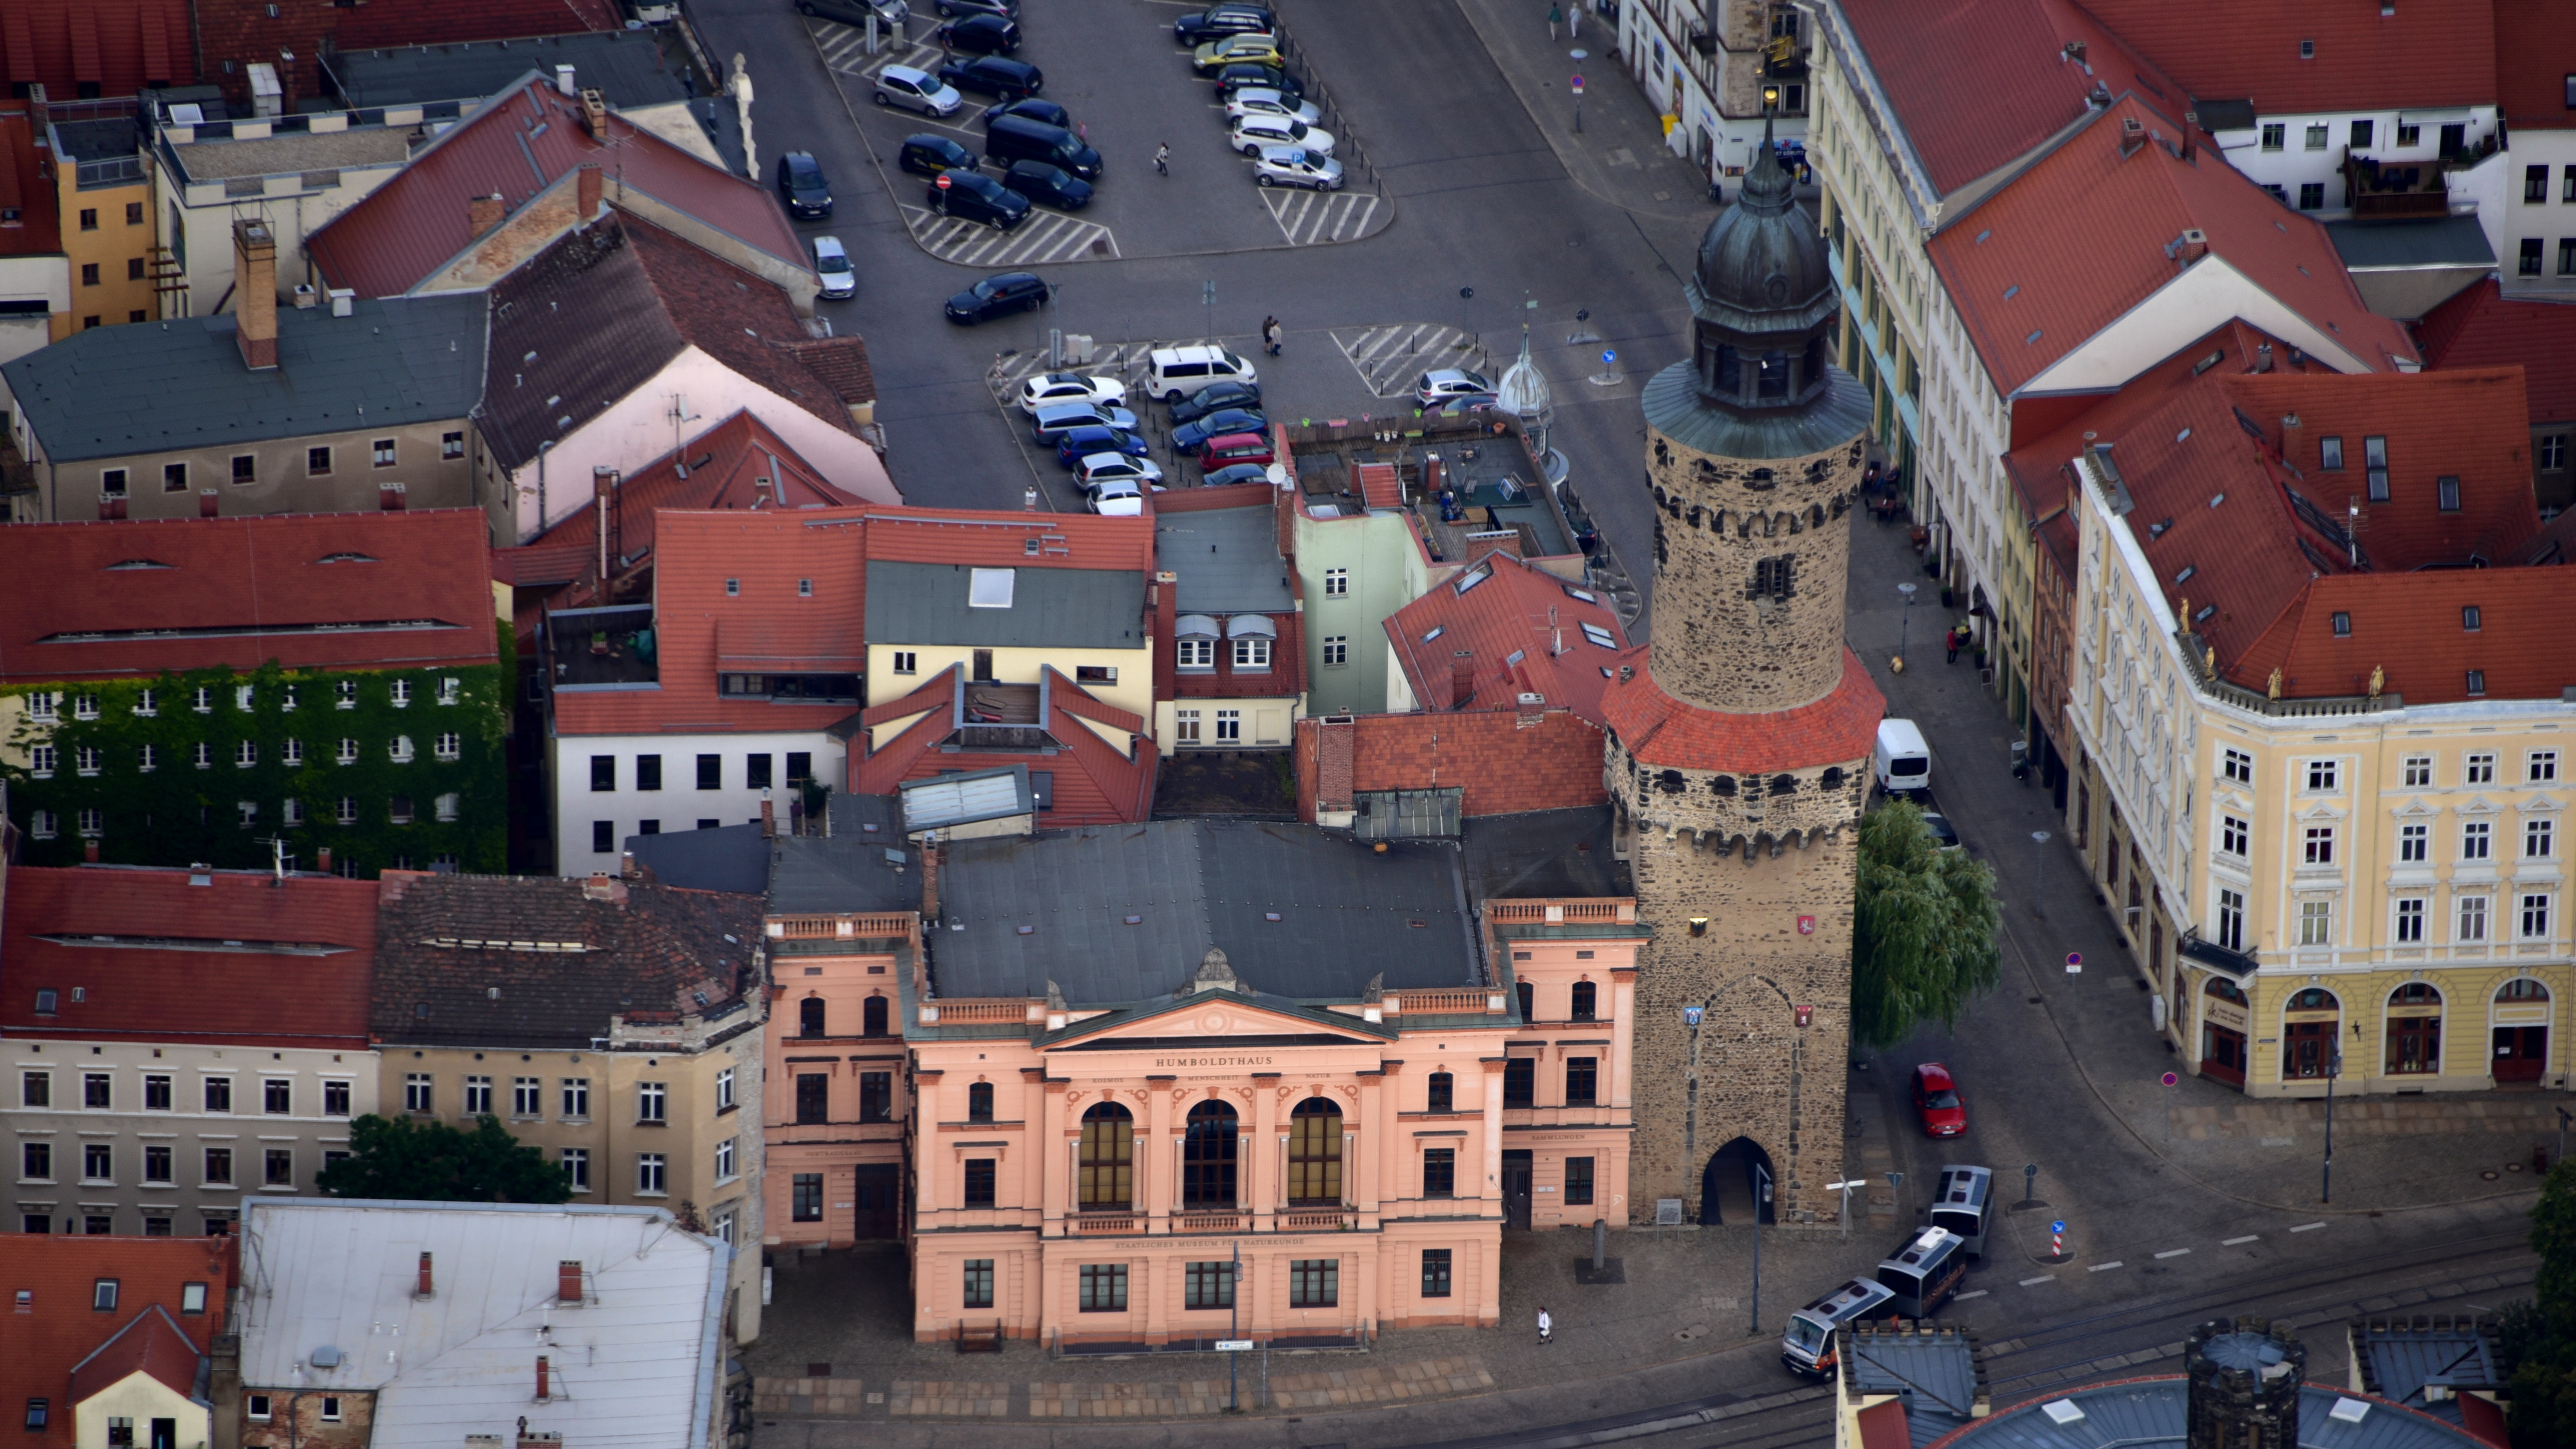 KLG_0279_G%C3%B6rlitz%2C_Humboldthaus%2C_Reichenbacher_Turm.jpg